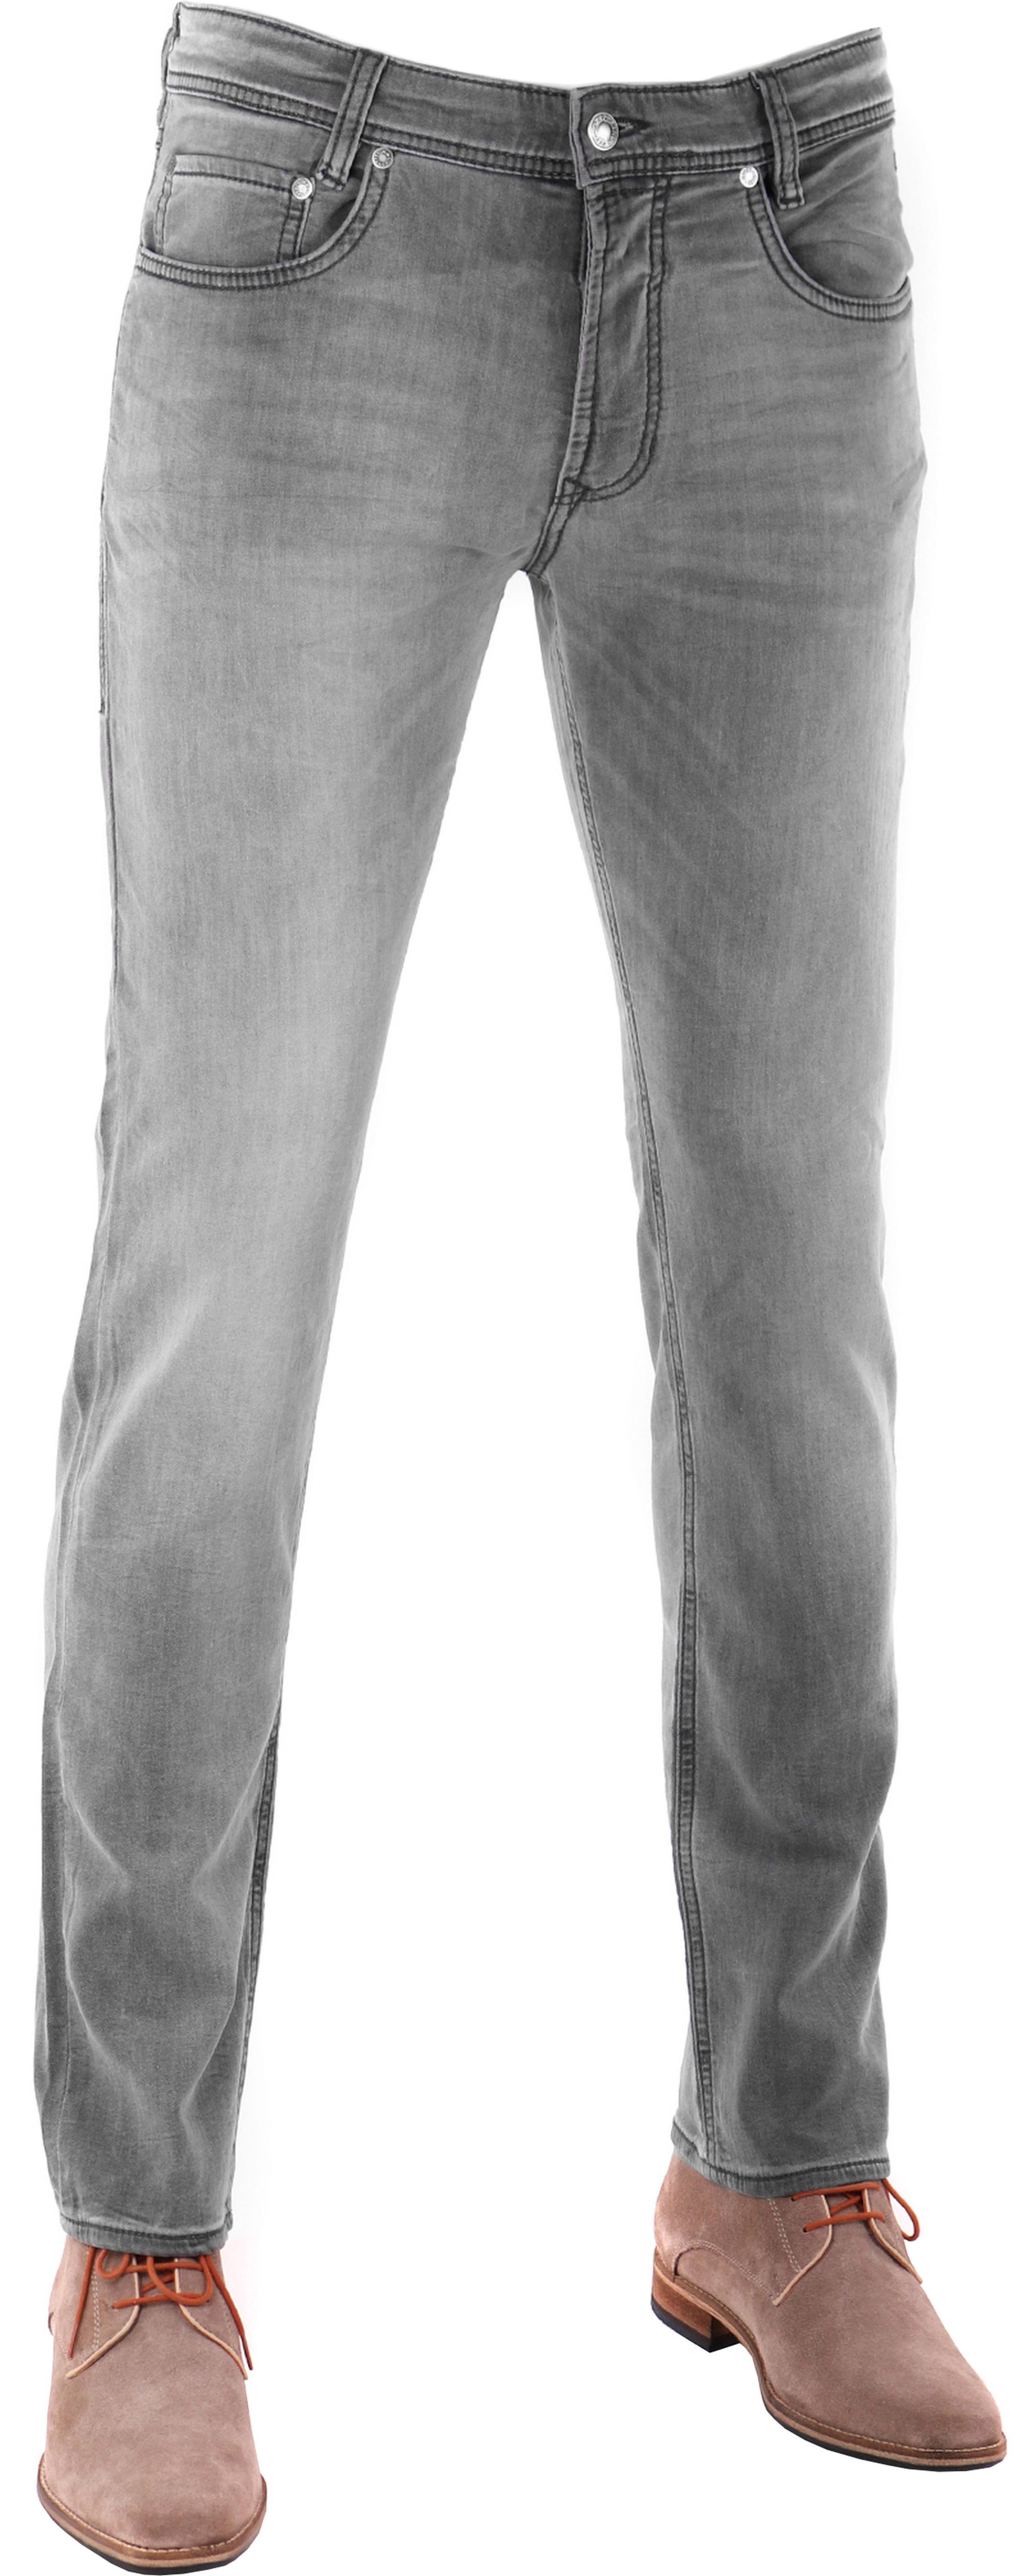 Mac Jog N Jeans Grau H825 foto 0